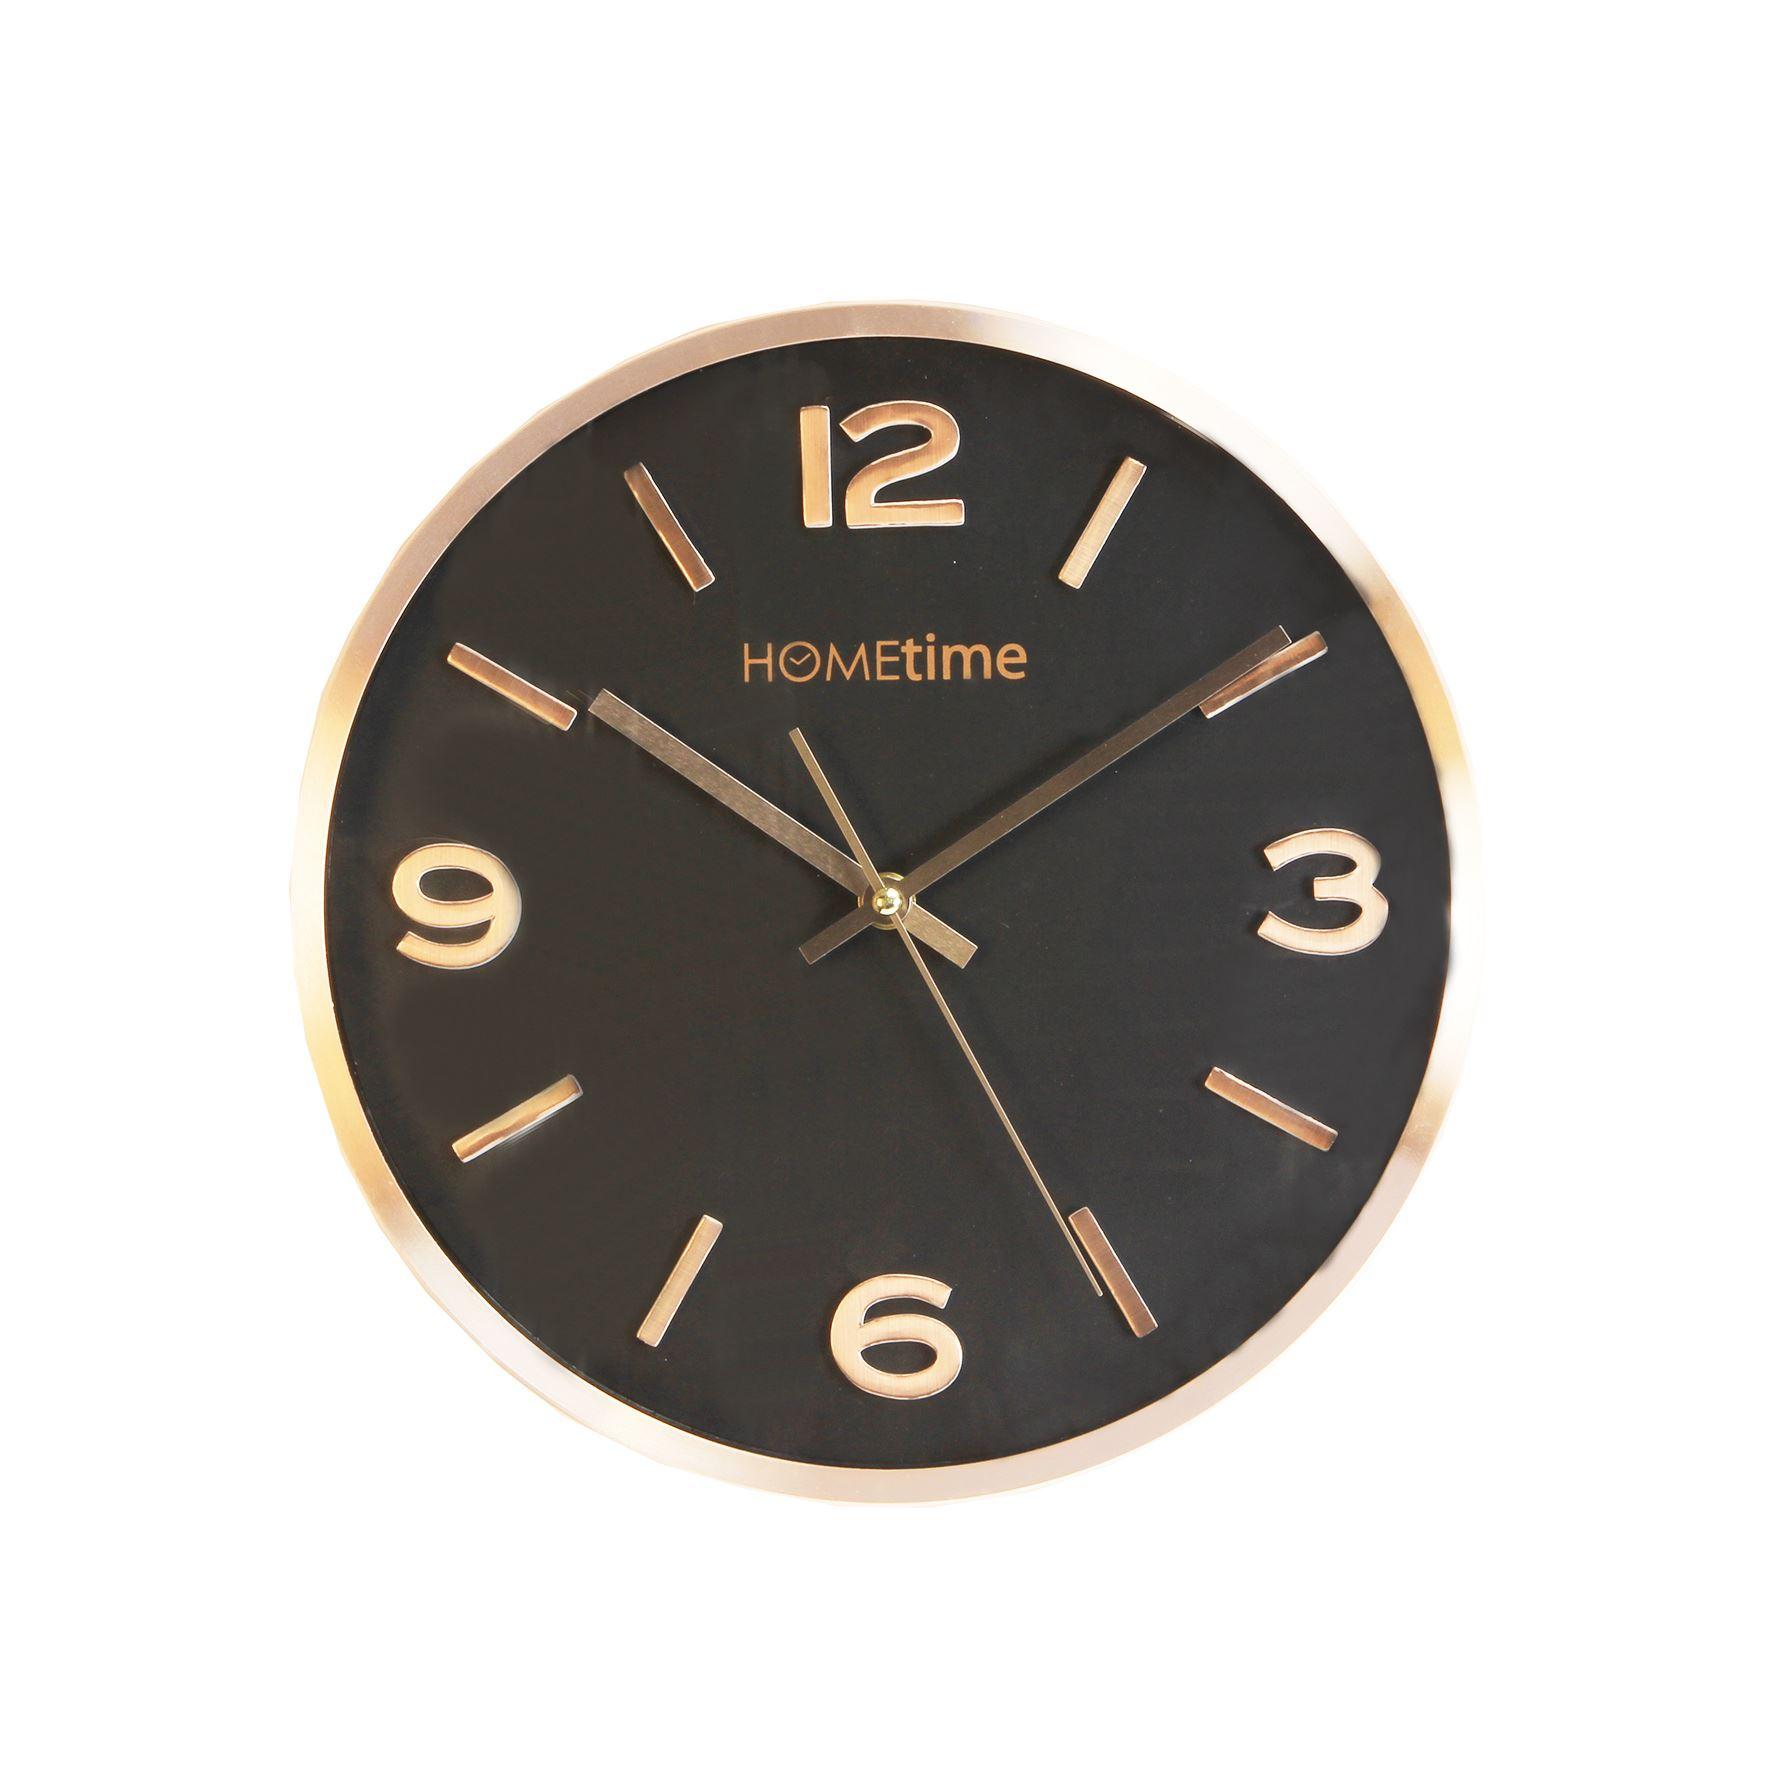 Hometime Aluminium Wall Clock Copper Finish Black Dial 30Cm